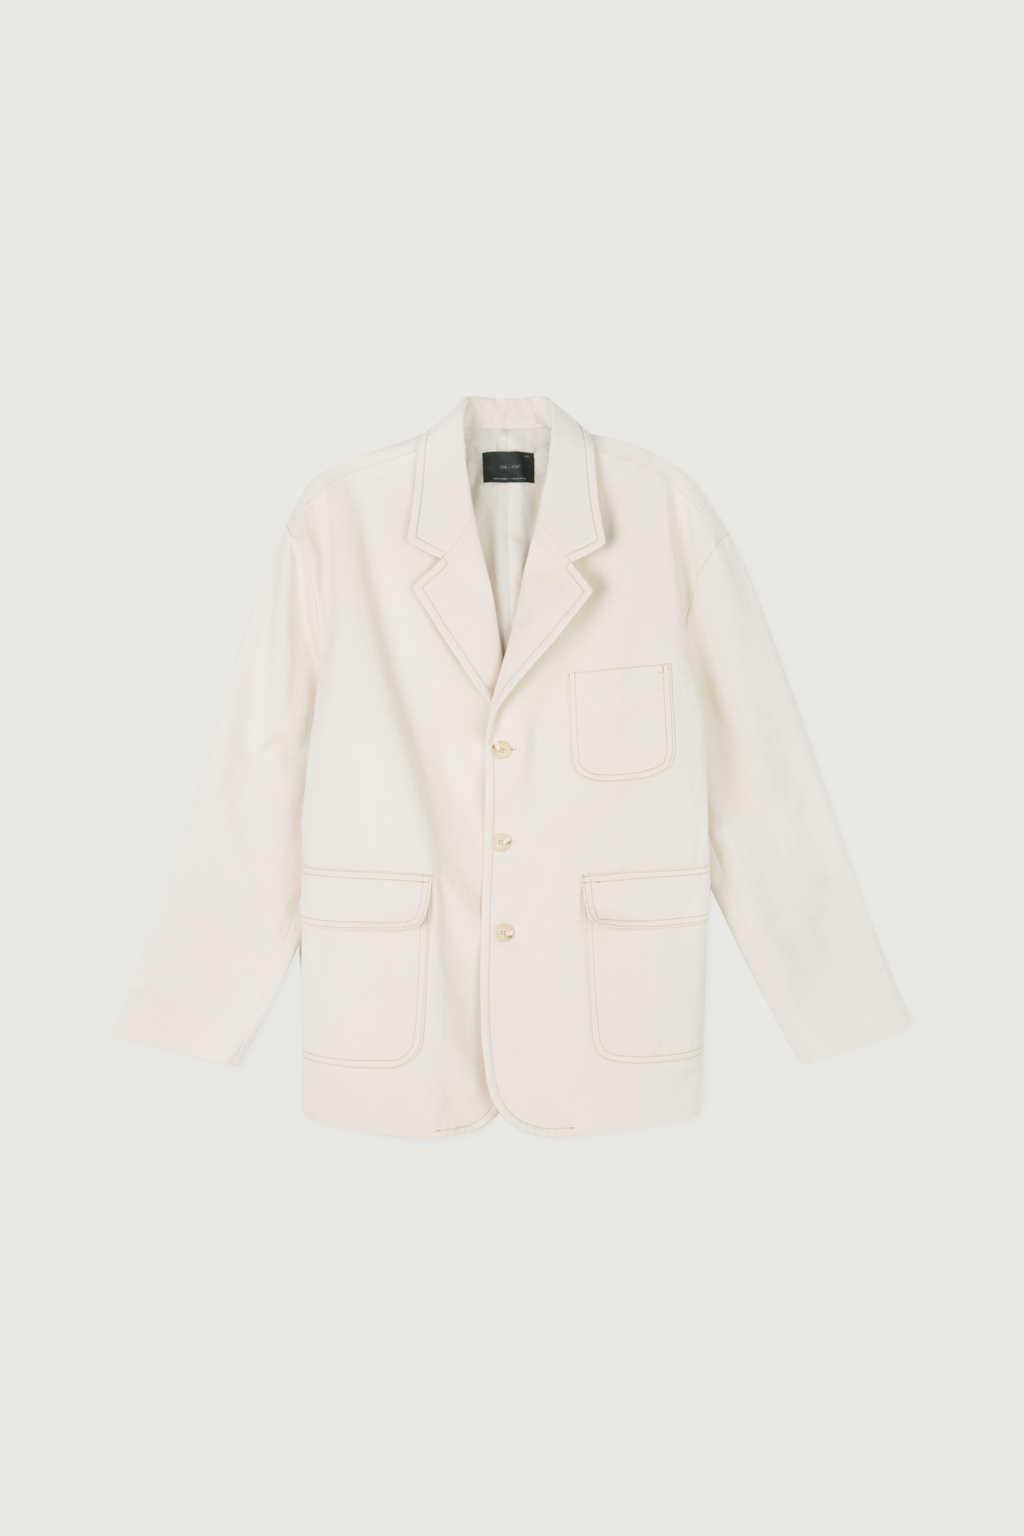 Jacket K002 Cream 5